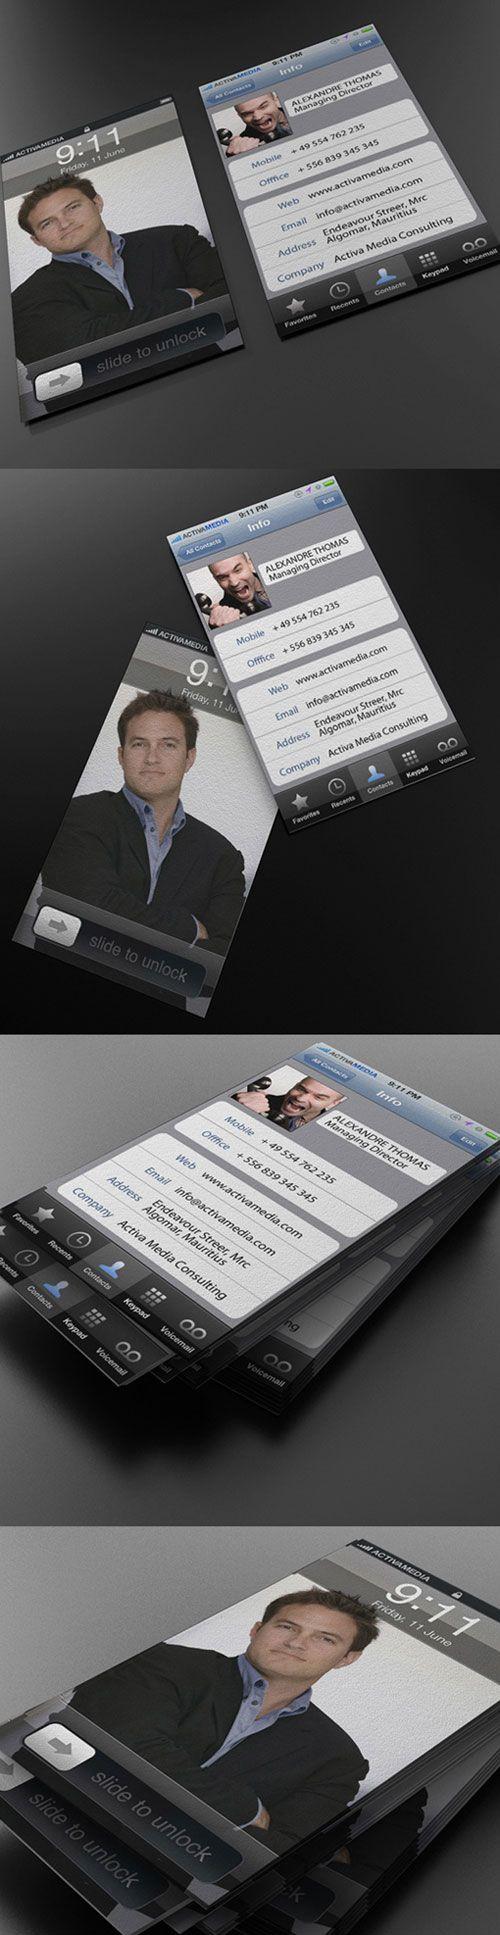 Activa media best business card designs 300 cool examples and activa media best business card designs 300 cool examples and ideas reheart Choice Image